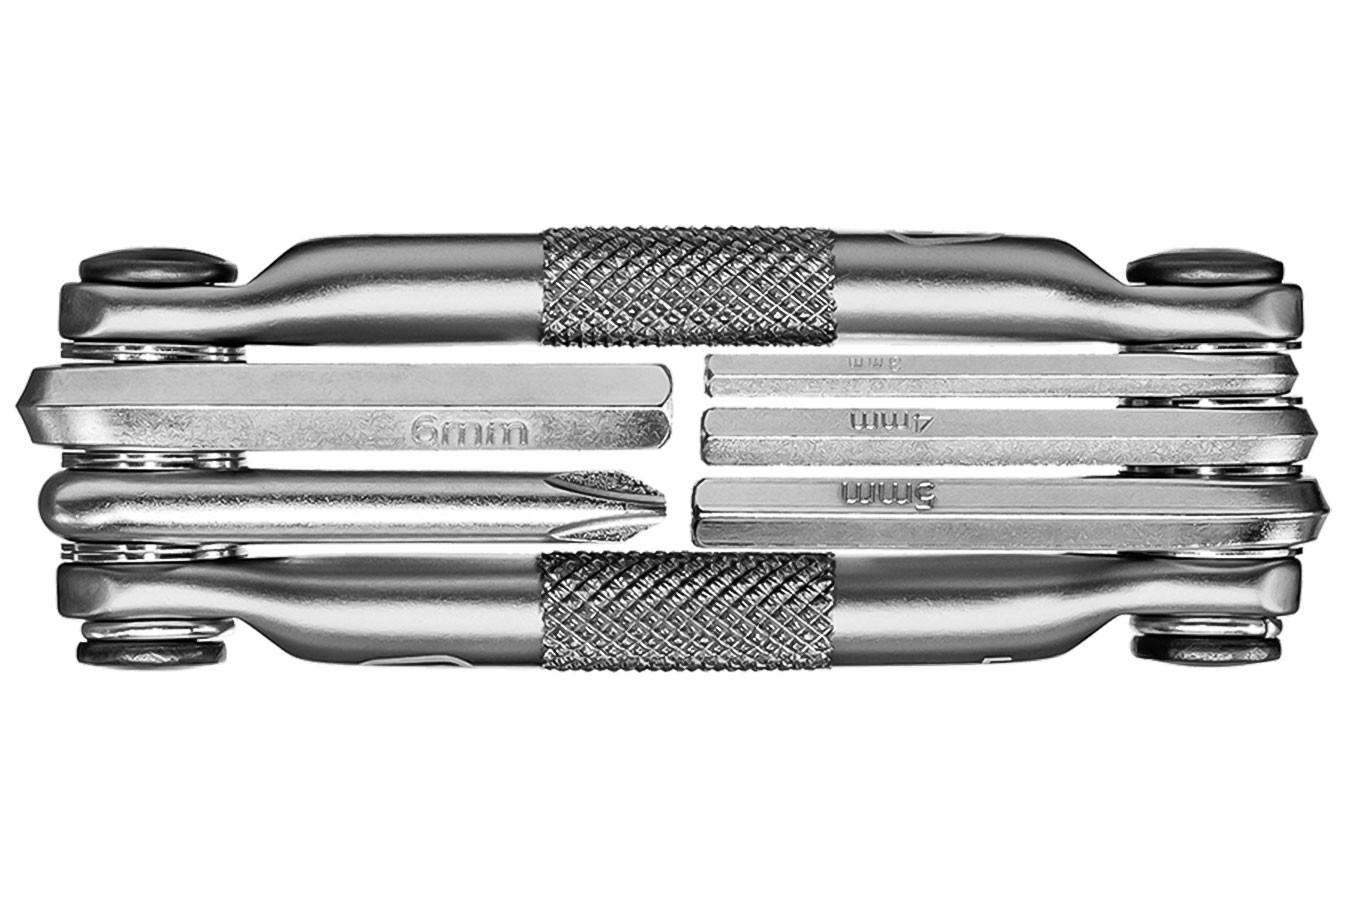 Canivete Crankbrothers Multi 5